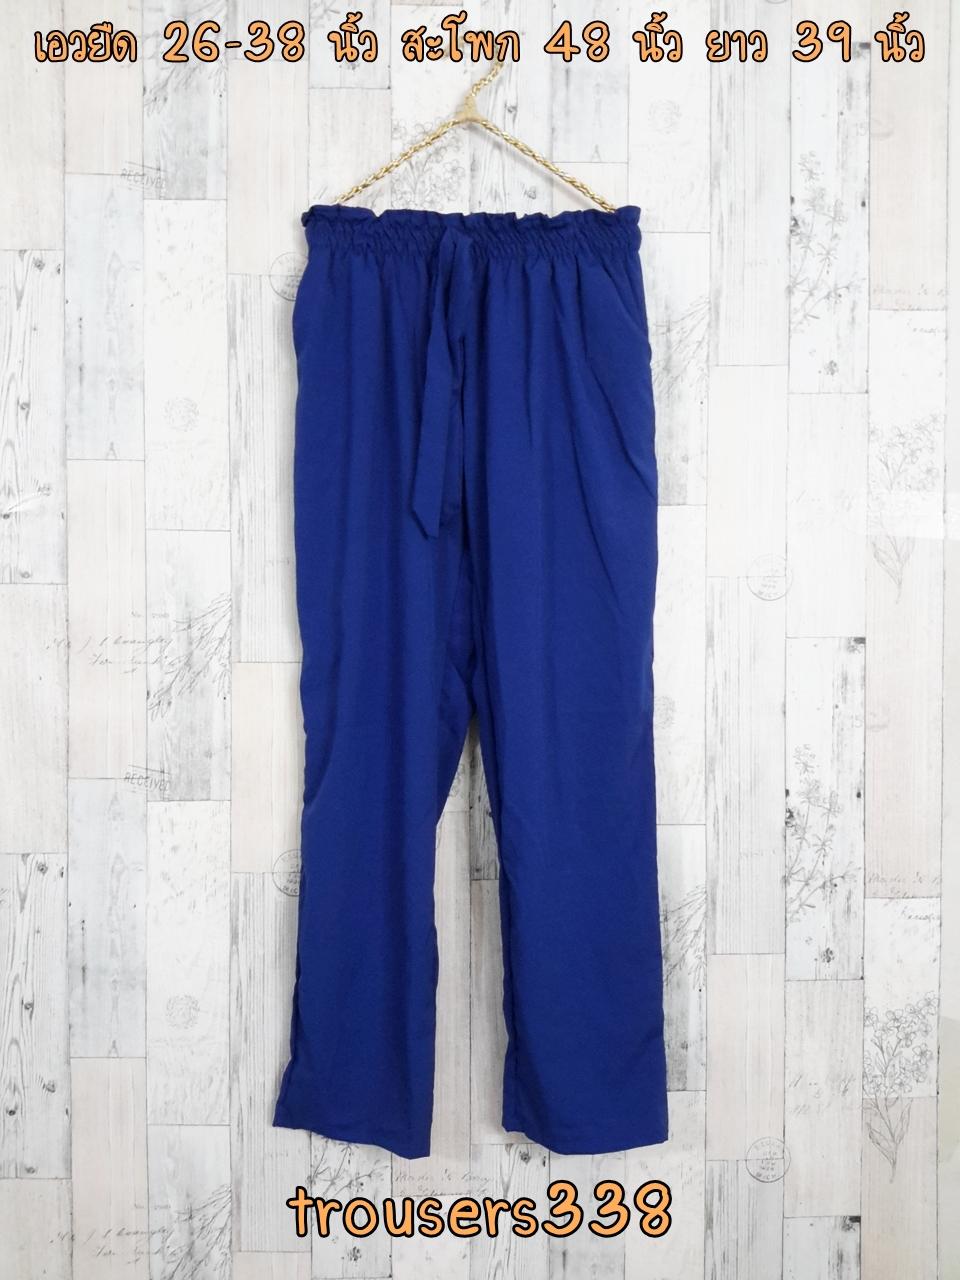 trousers338 กางเกงขายาวผ้าไหมอิตาลีเอวยืด 26-38 นิ้ว สีพื้นน้ำเงิน